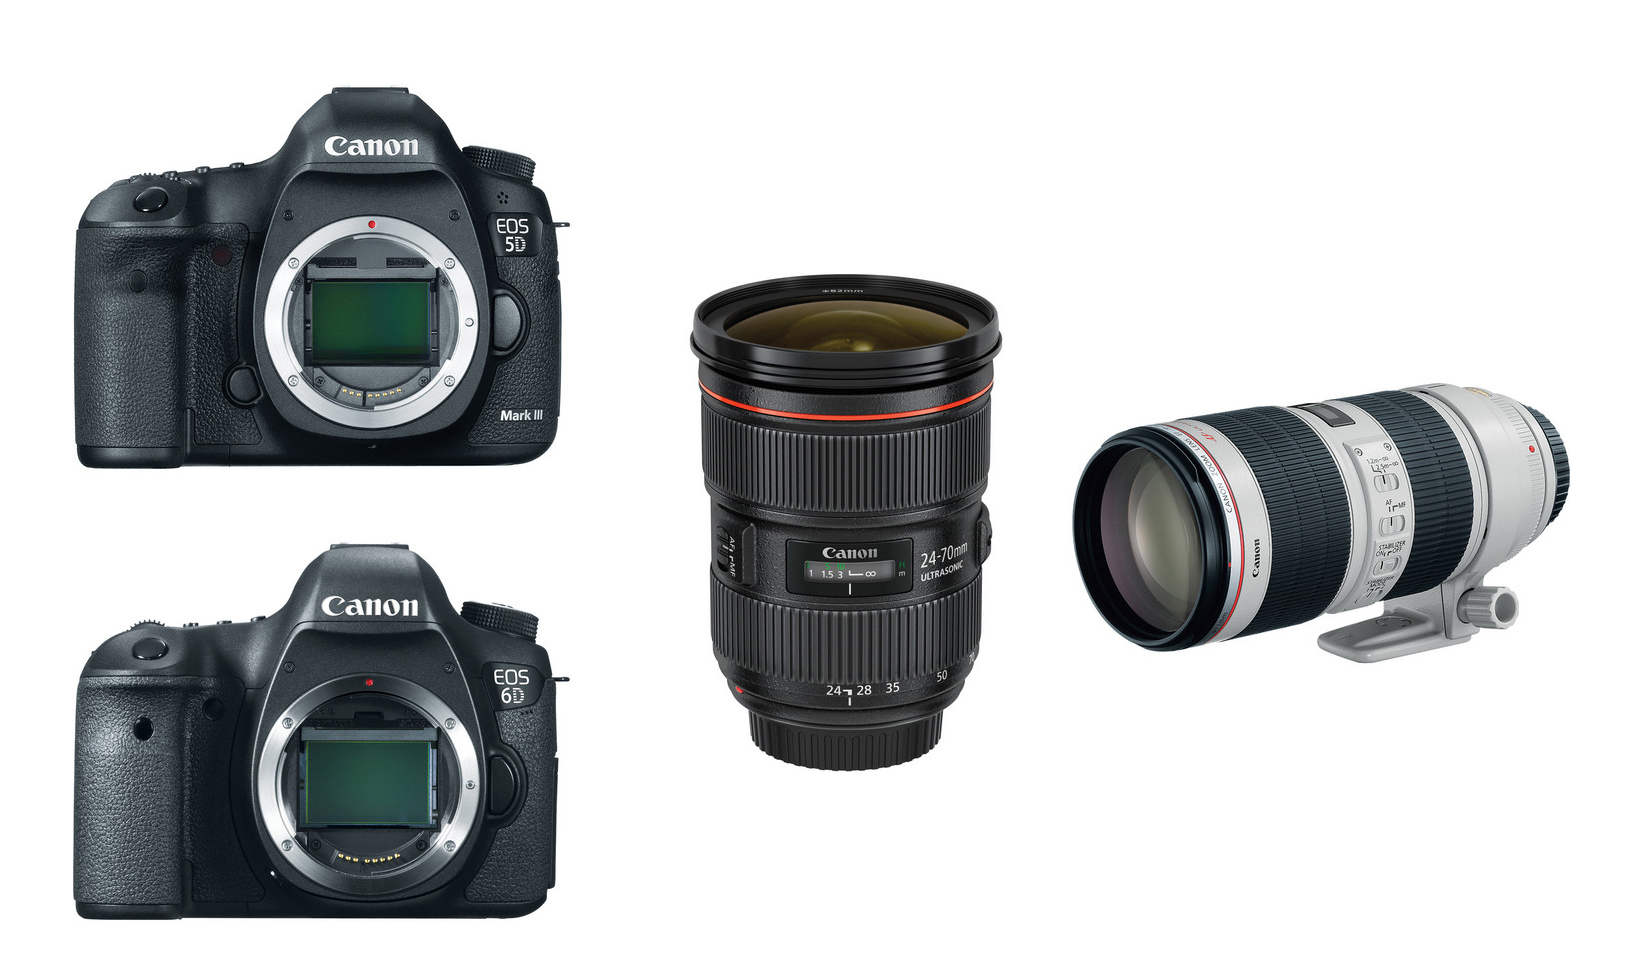 Canon eos 5d mark iii camera news at cameraegg for Canon 5d mark ii price